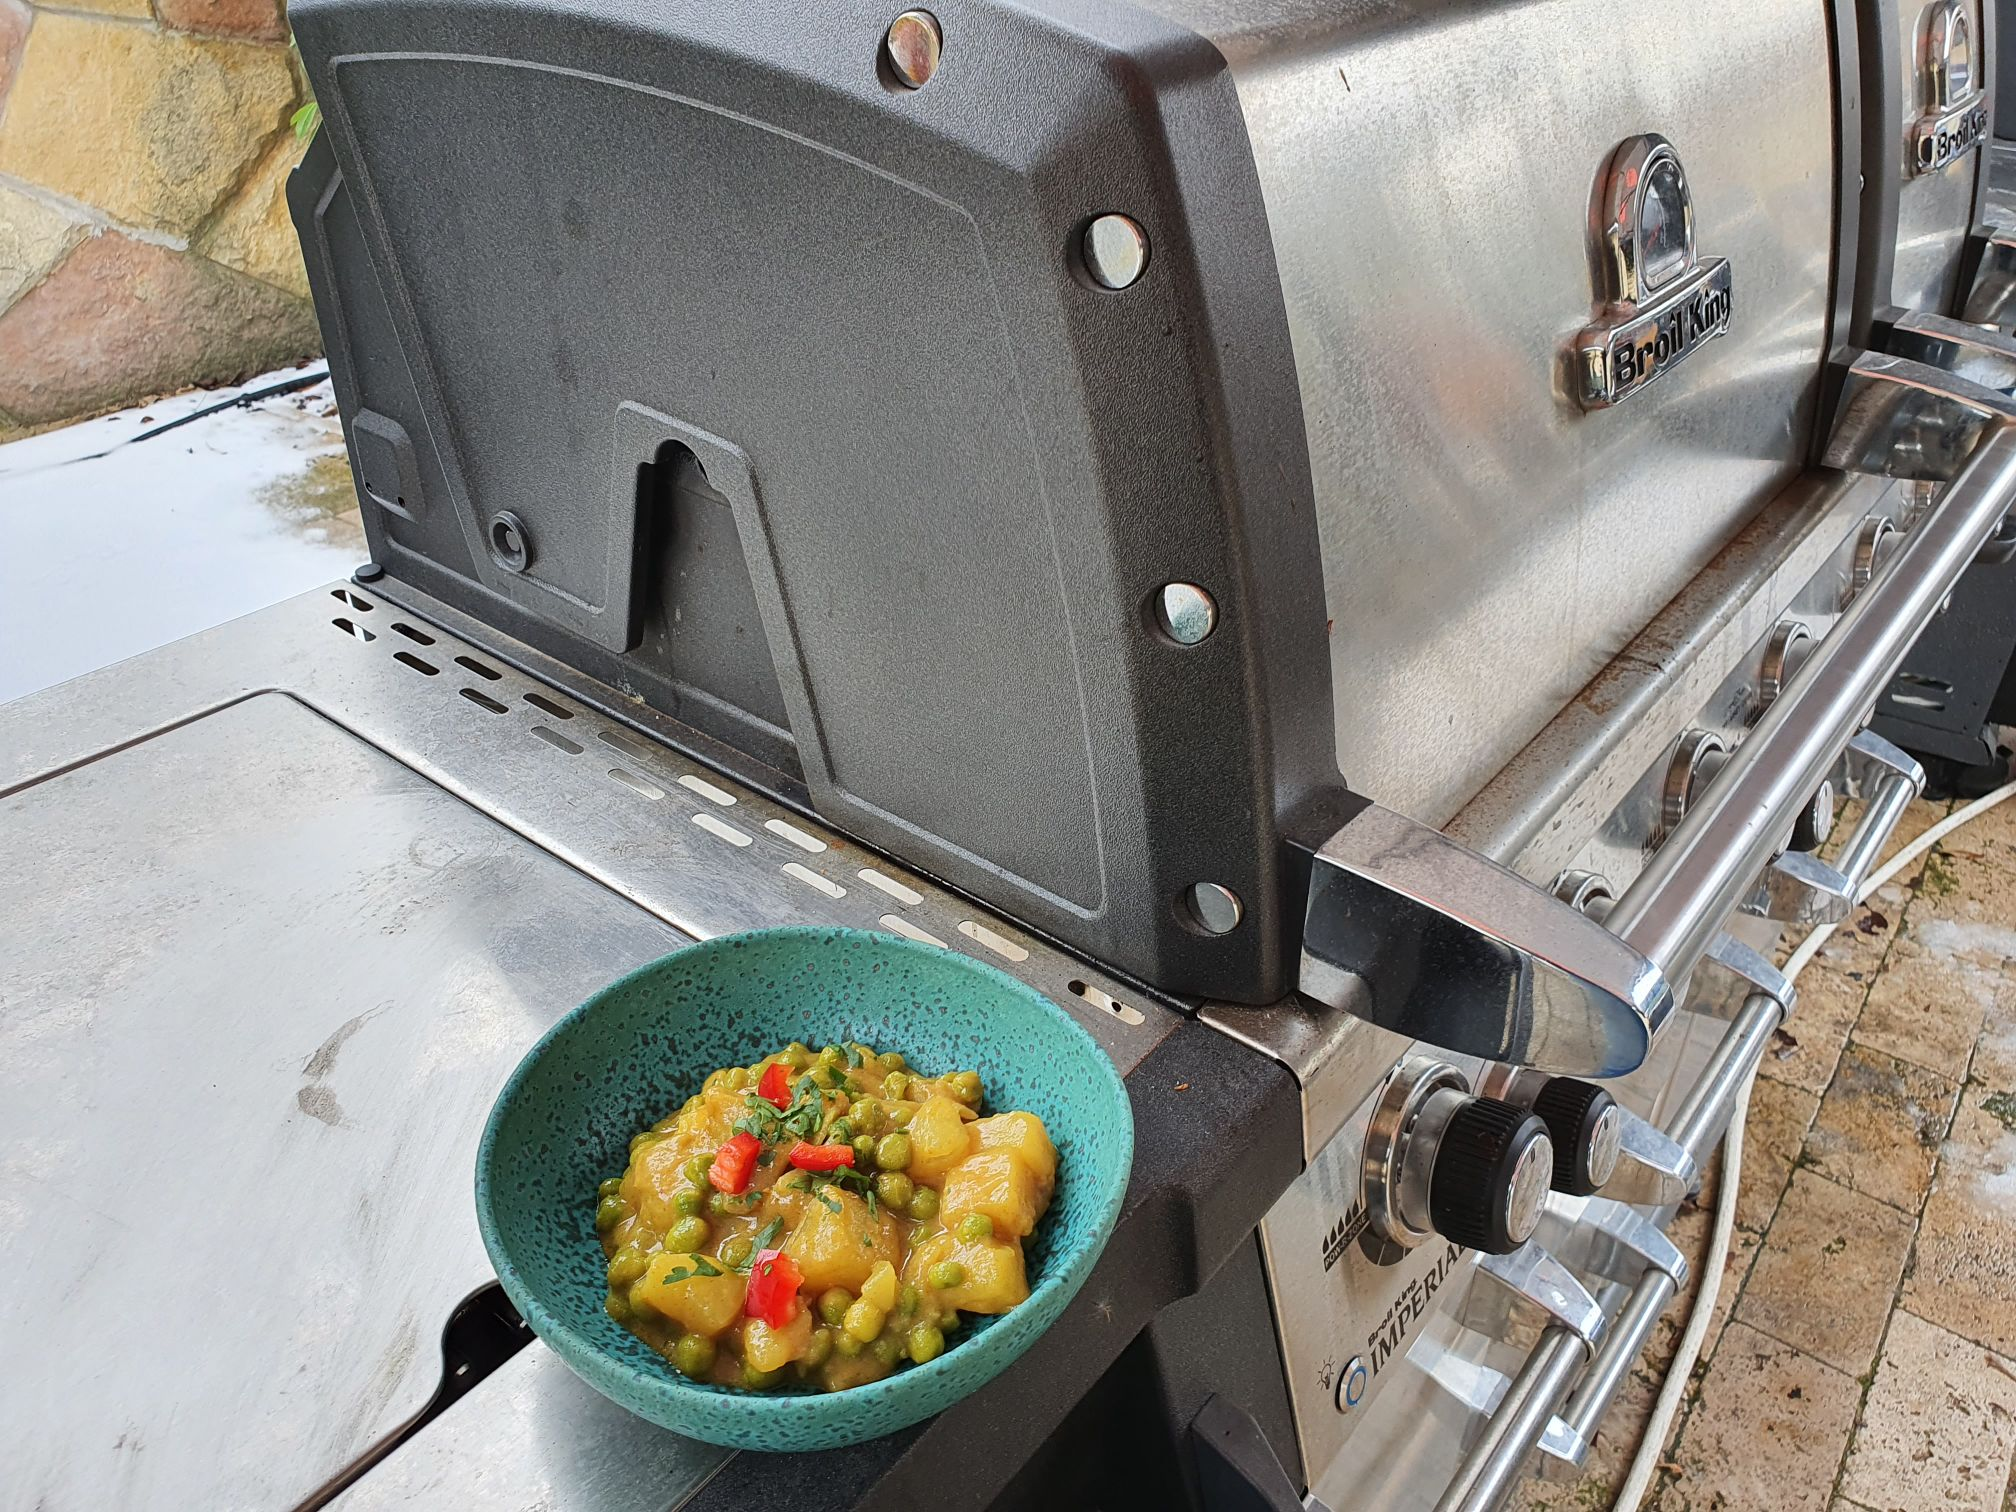 Zölborsós burgonya curry Broil King Imperial gázgrillben